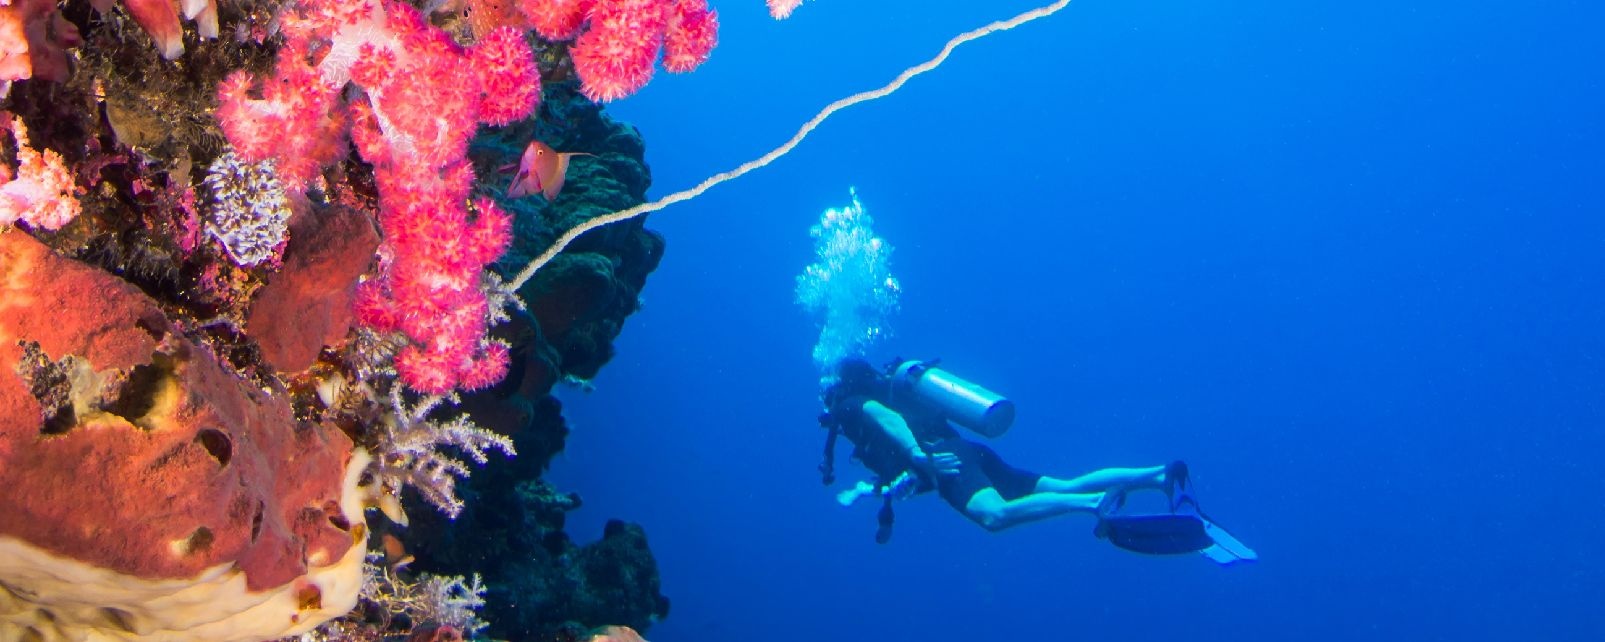 La plongée , Indonésie